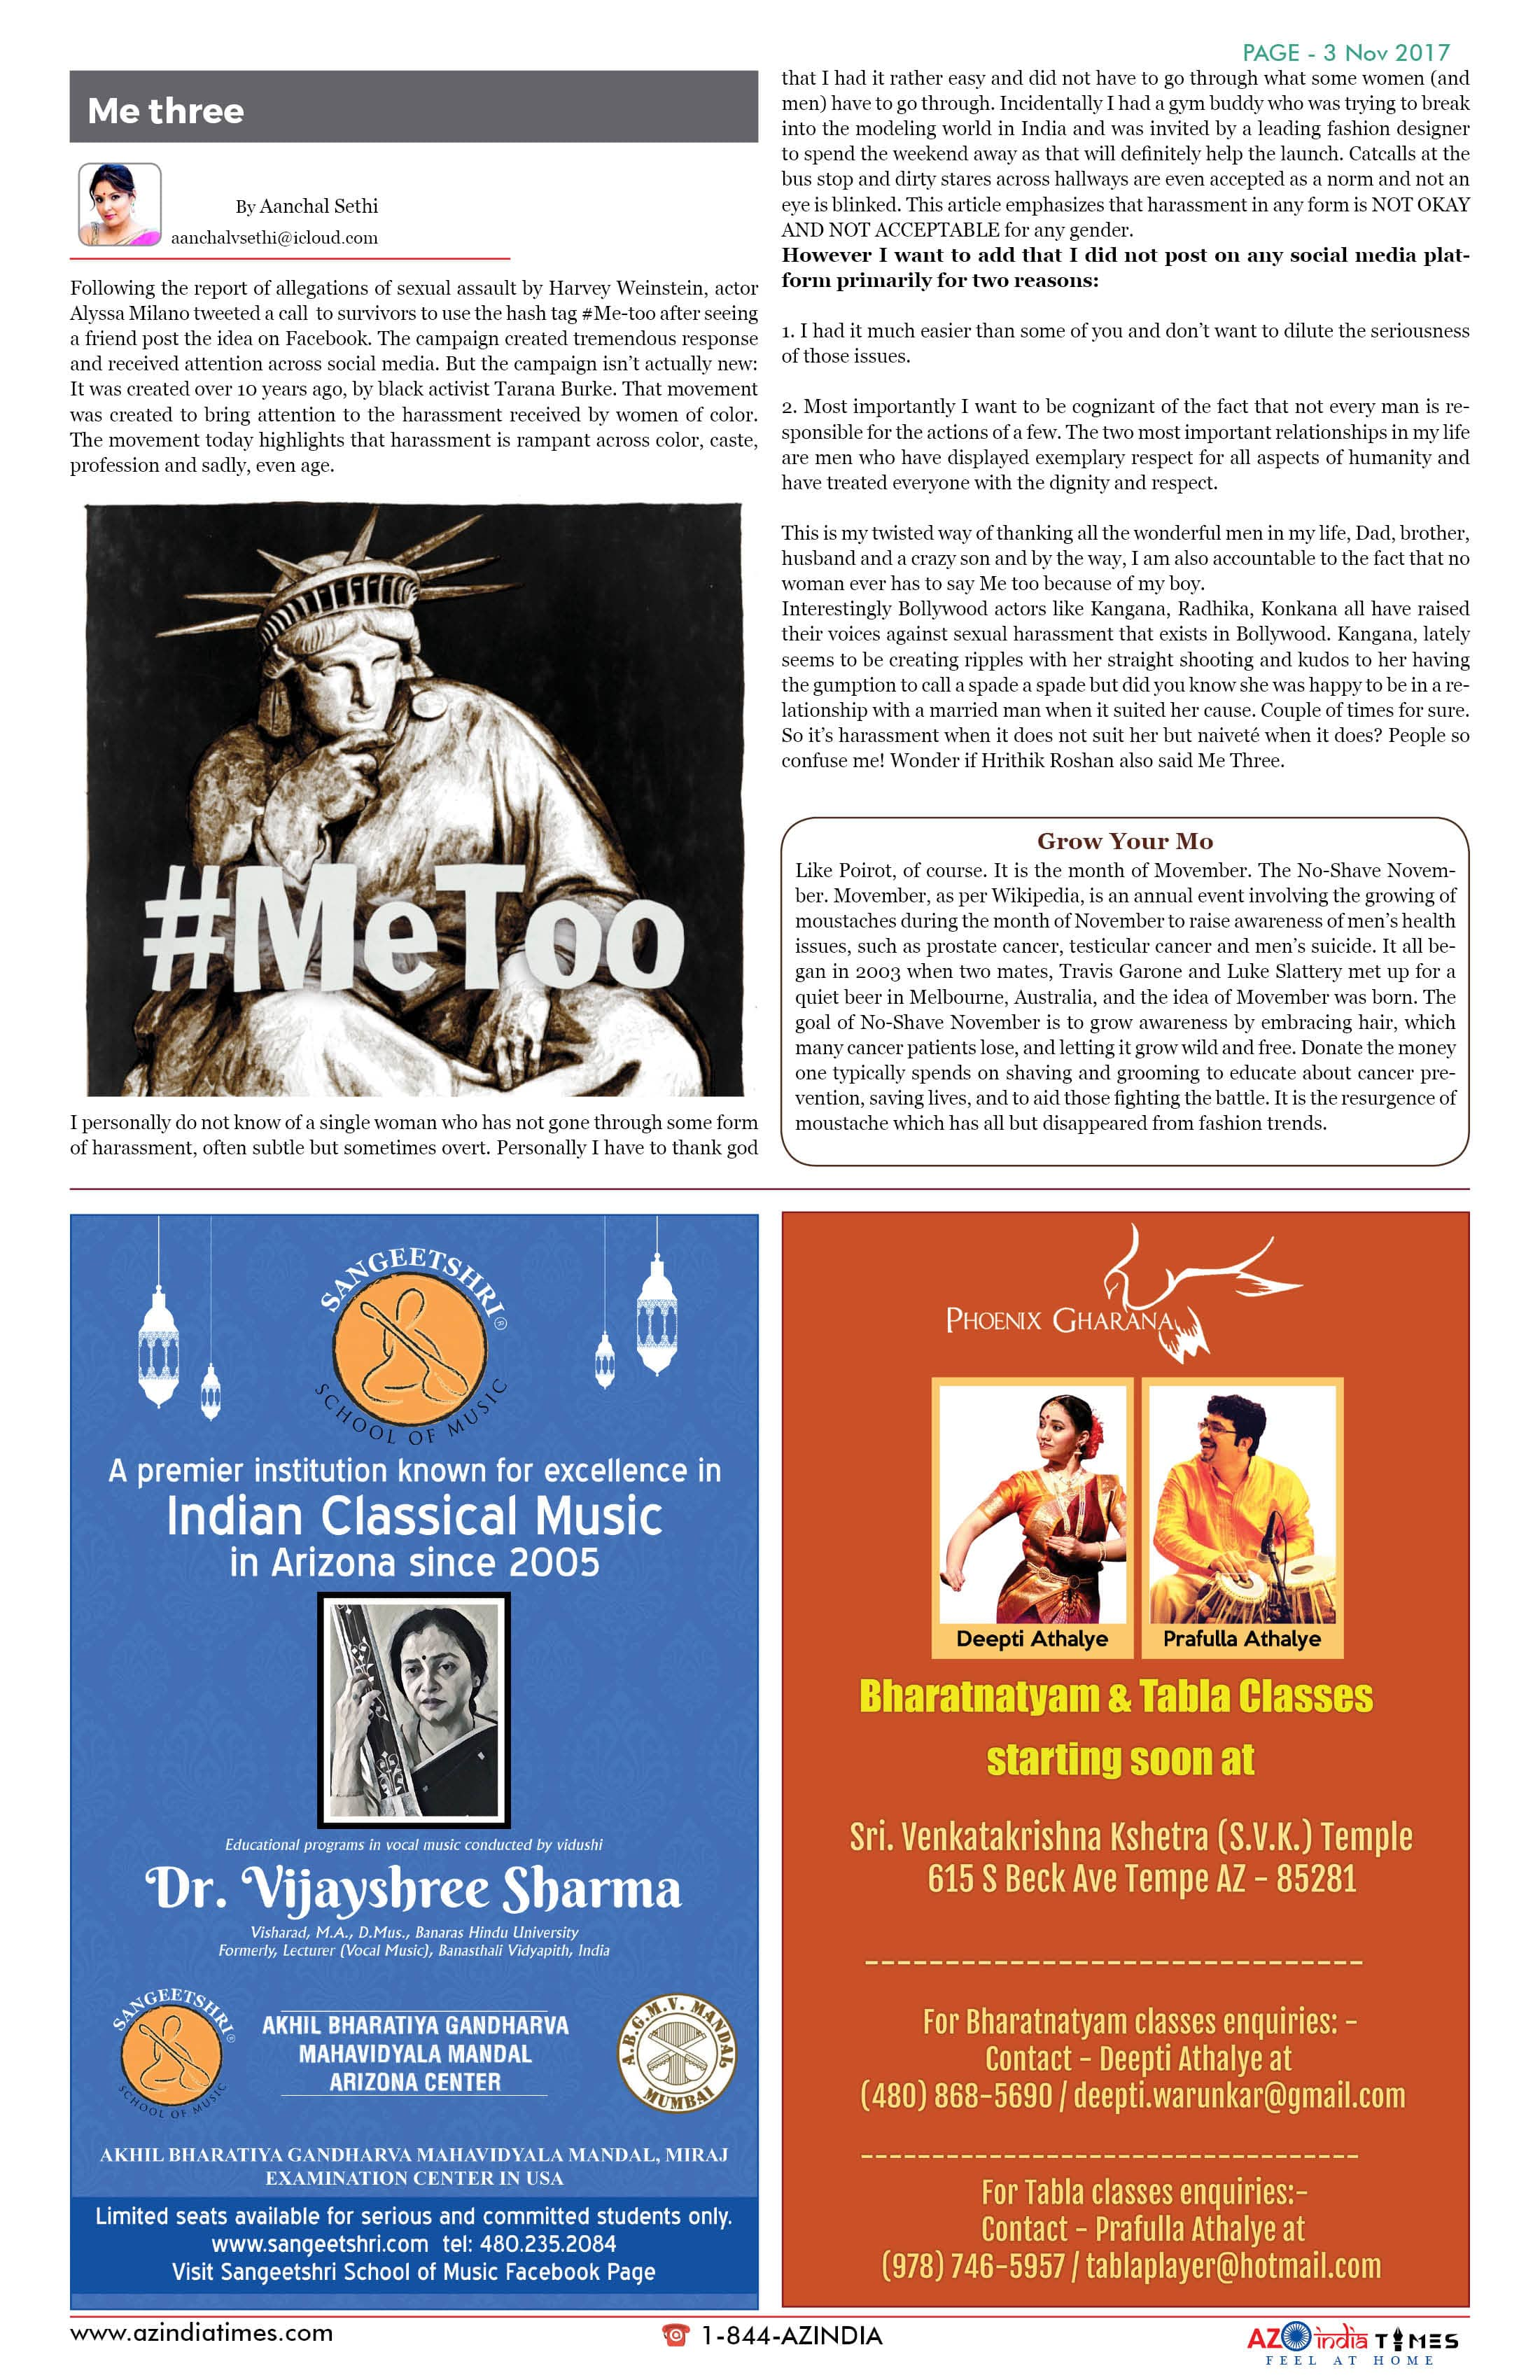 AZ INDIA TIMES NOVEMBER EDITION3